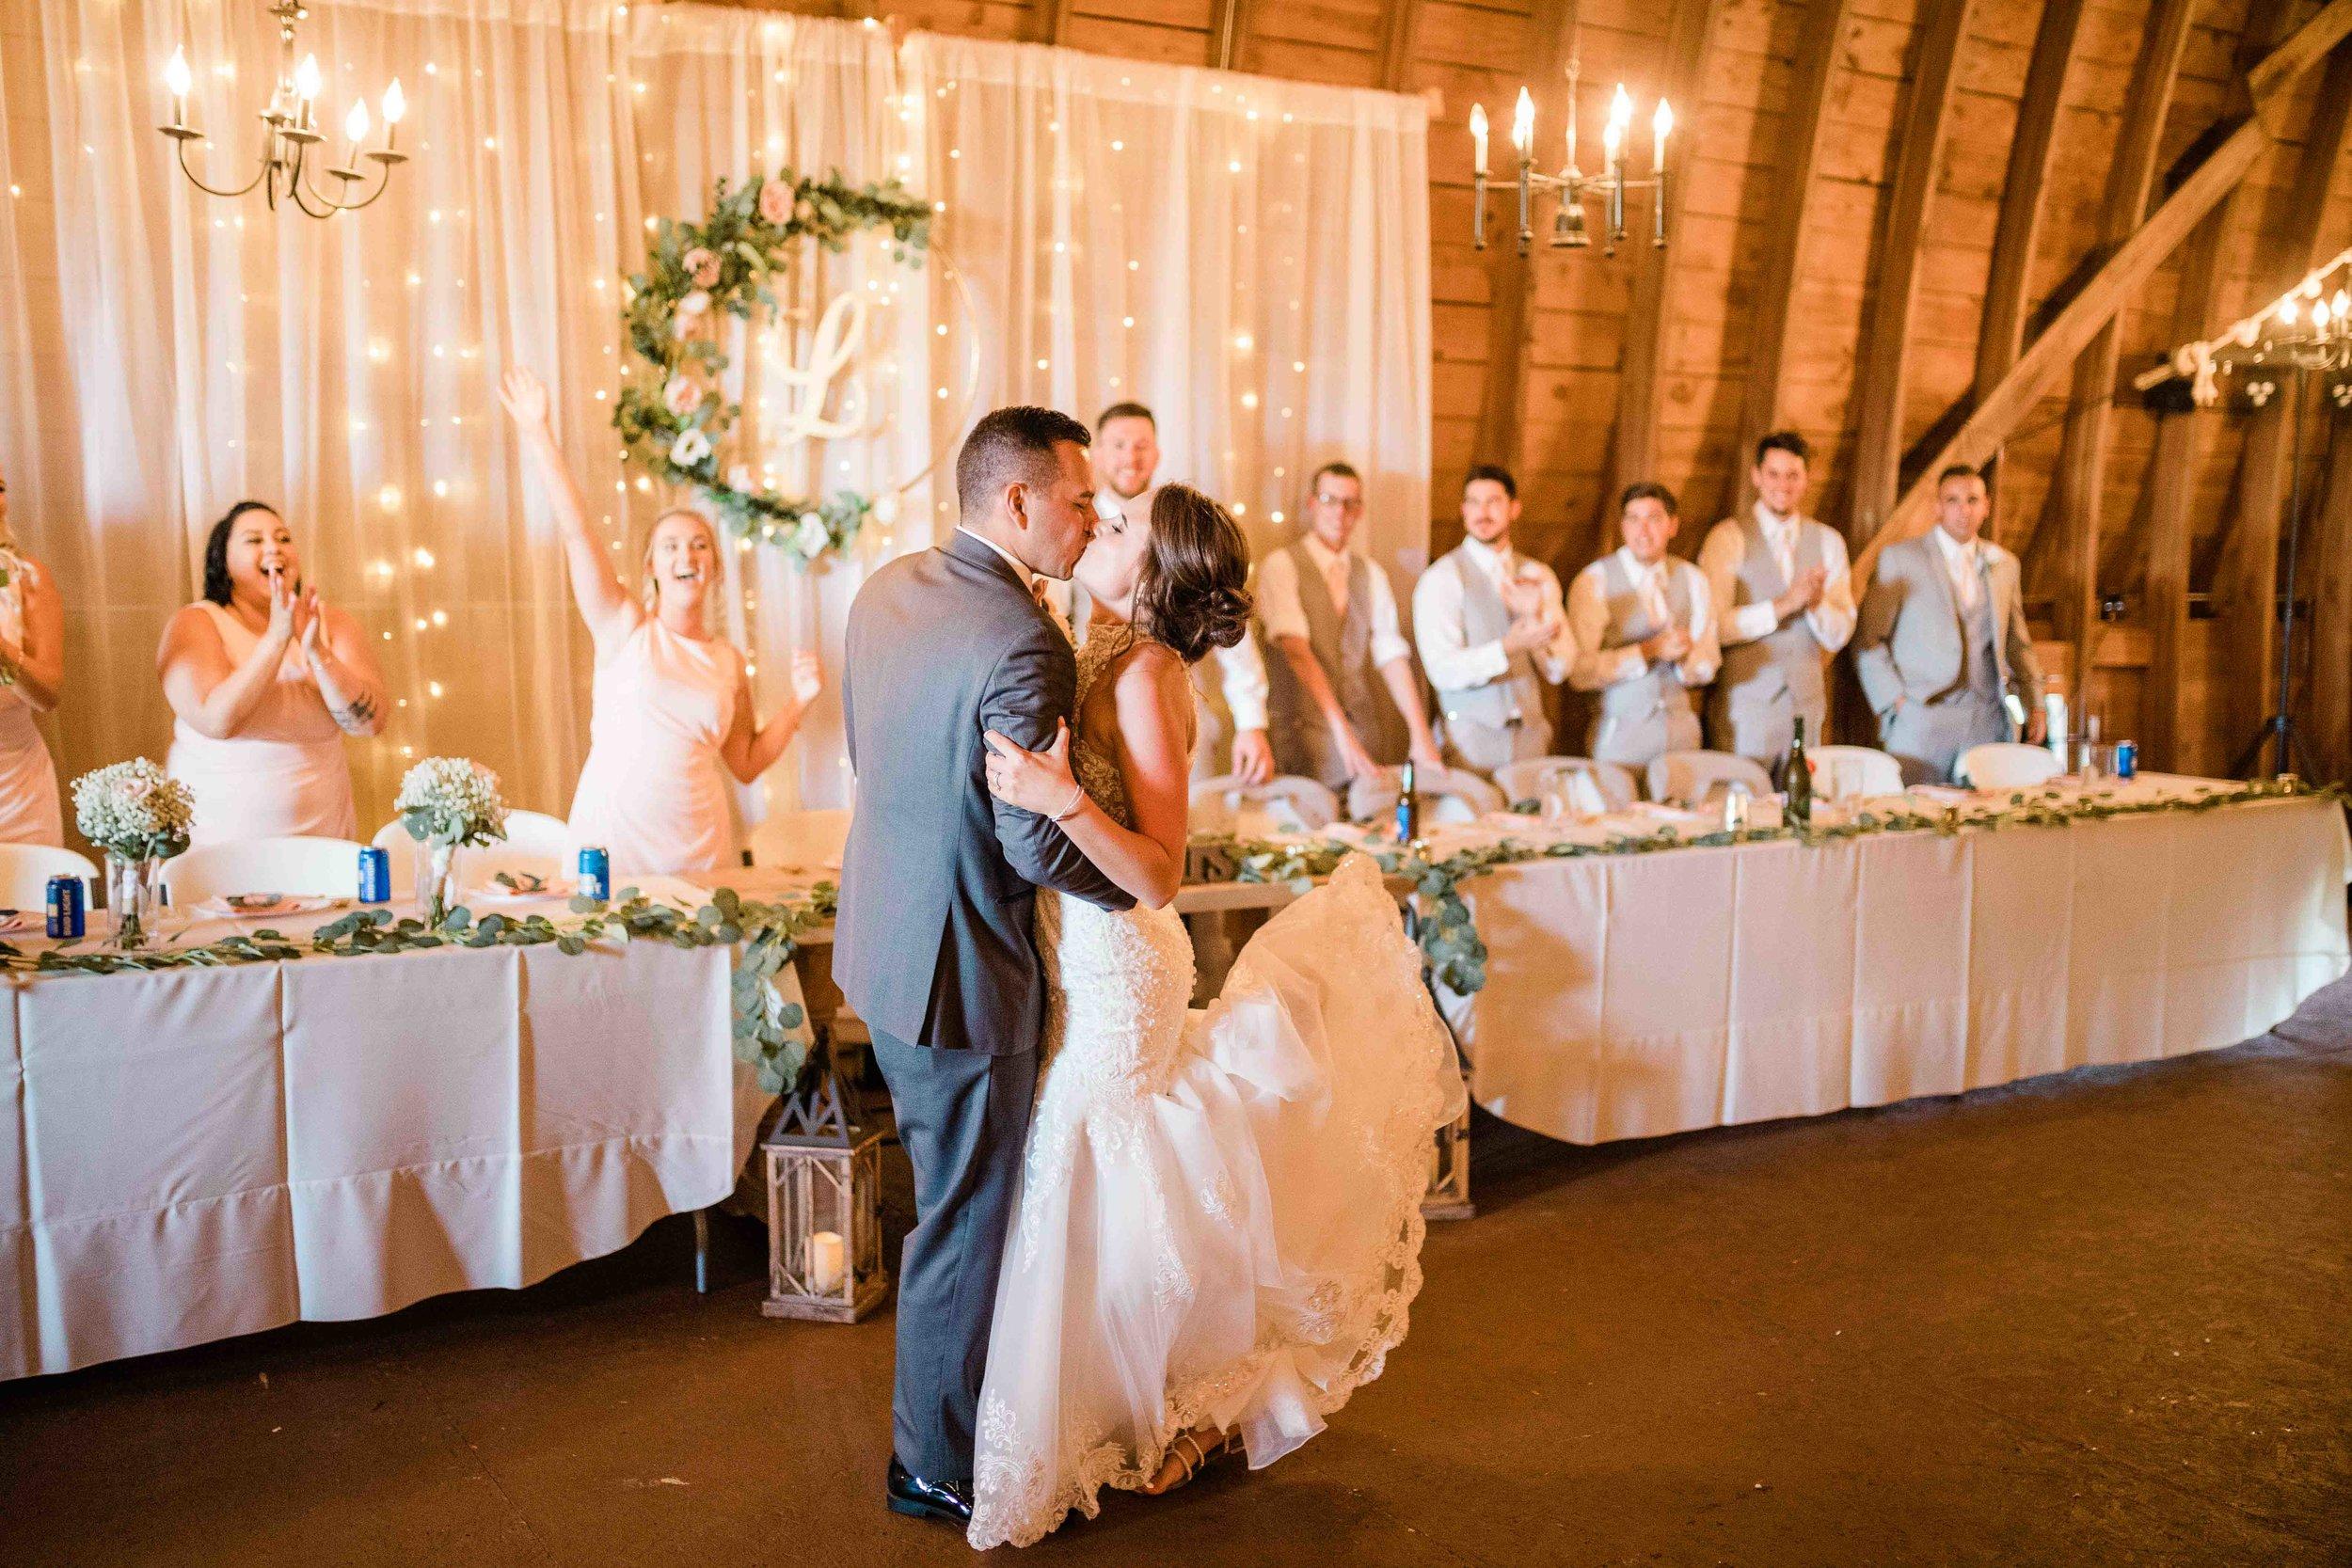 wren farm ohio wedding photography-5.jpg